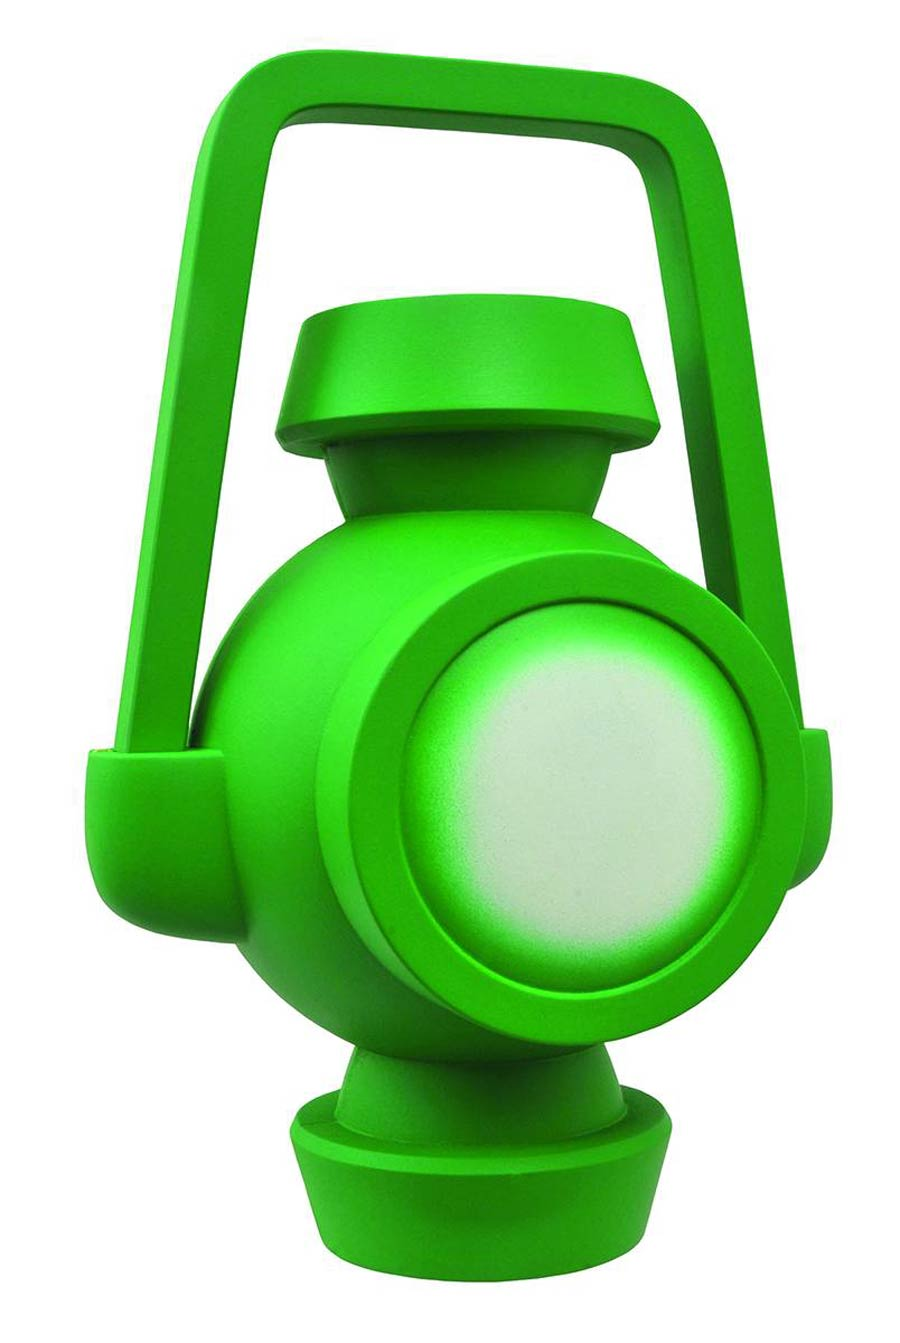 Justice League Animated Green Lantern Battery Vinyl Bank